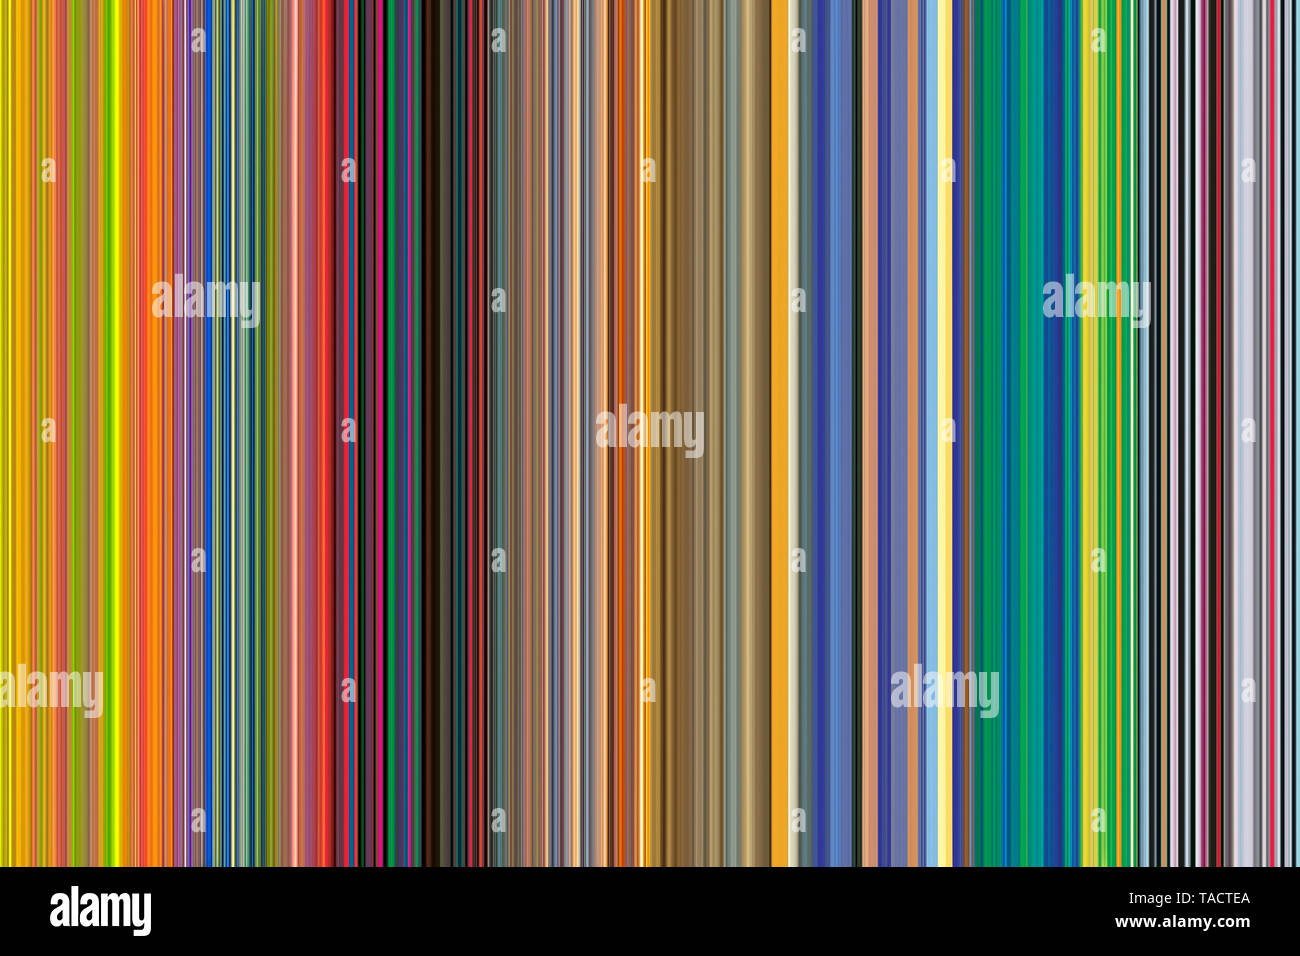 Modern fine art computer digital paintings creative hypnotist imagination colourful line vhm 31/3/2015. - Stock Image